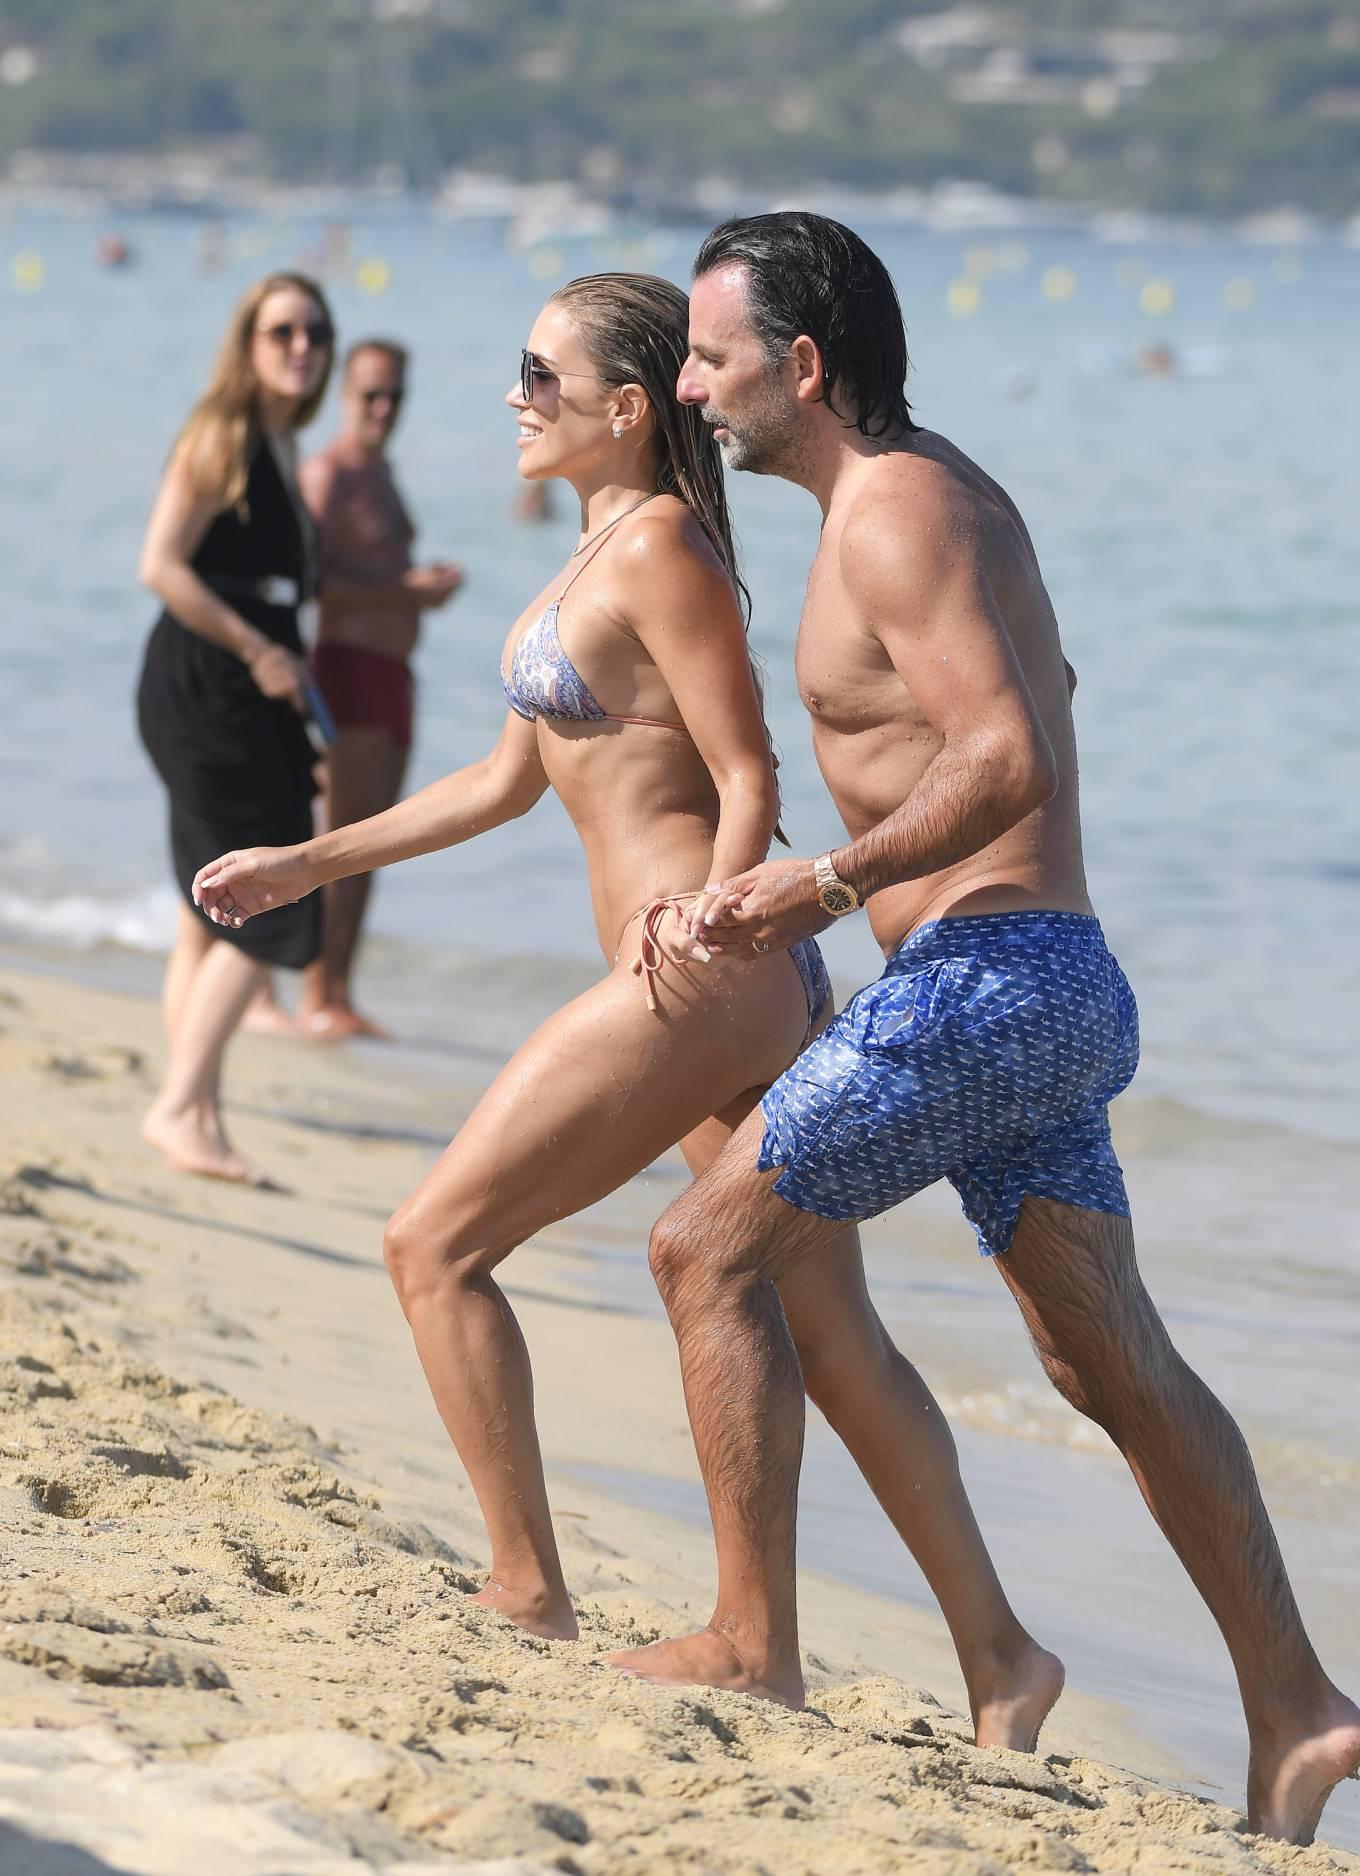 Sylvie Meis 2021 : Sylvie Meis – In a bikini with her husband Niclas Castello on the beach La Réserve in Ramatuelle-02